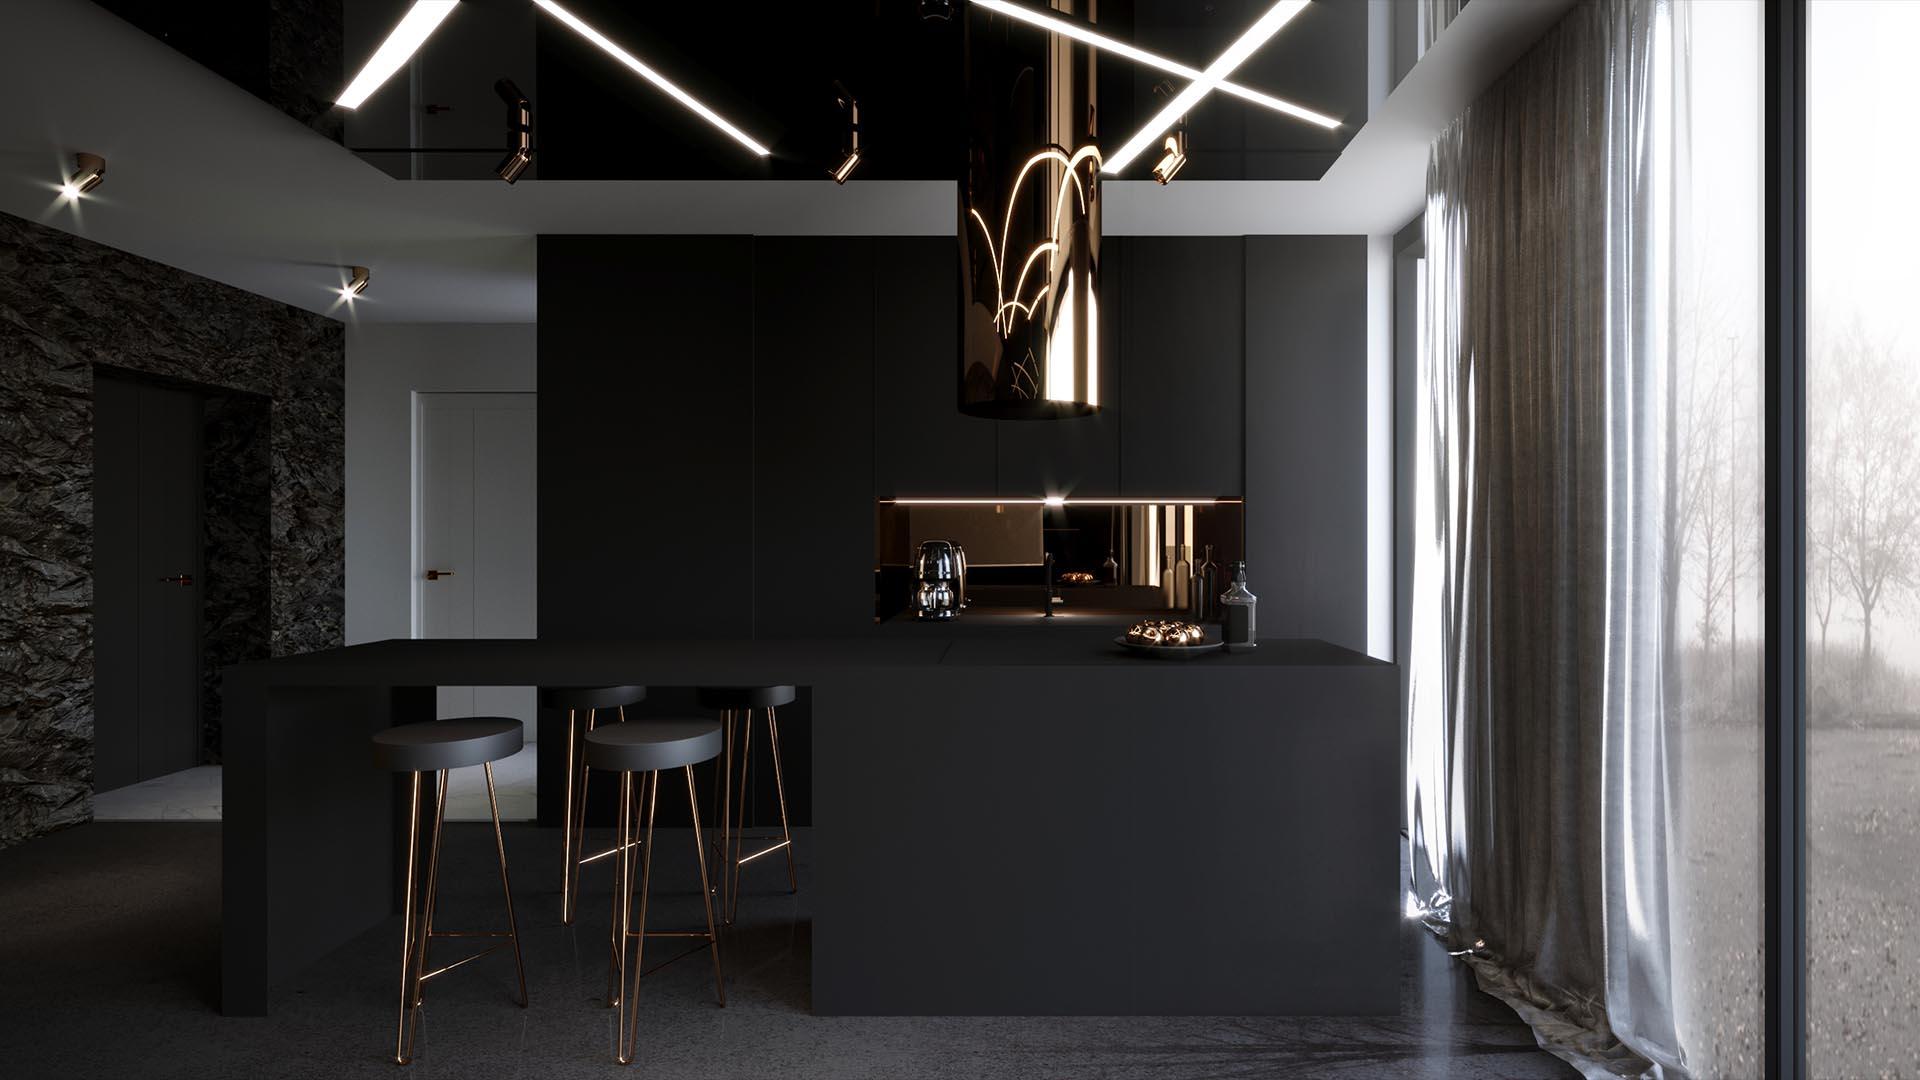 Apartament kometa - wizualizacja kuchni